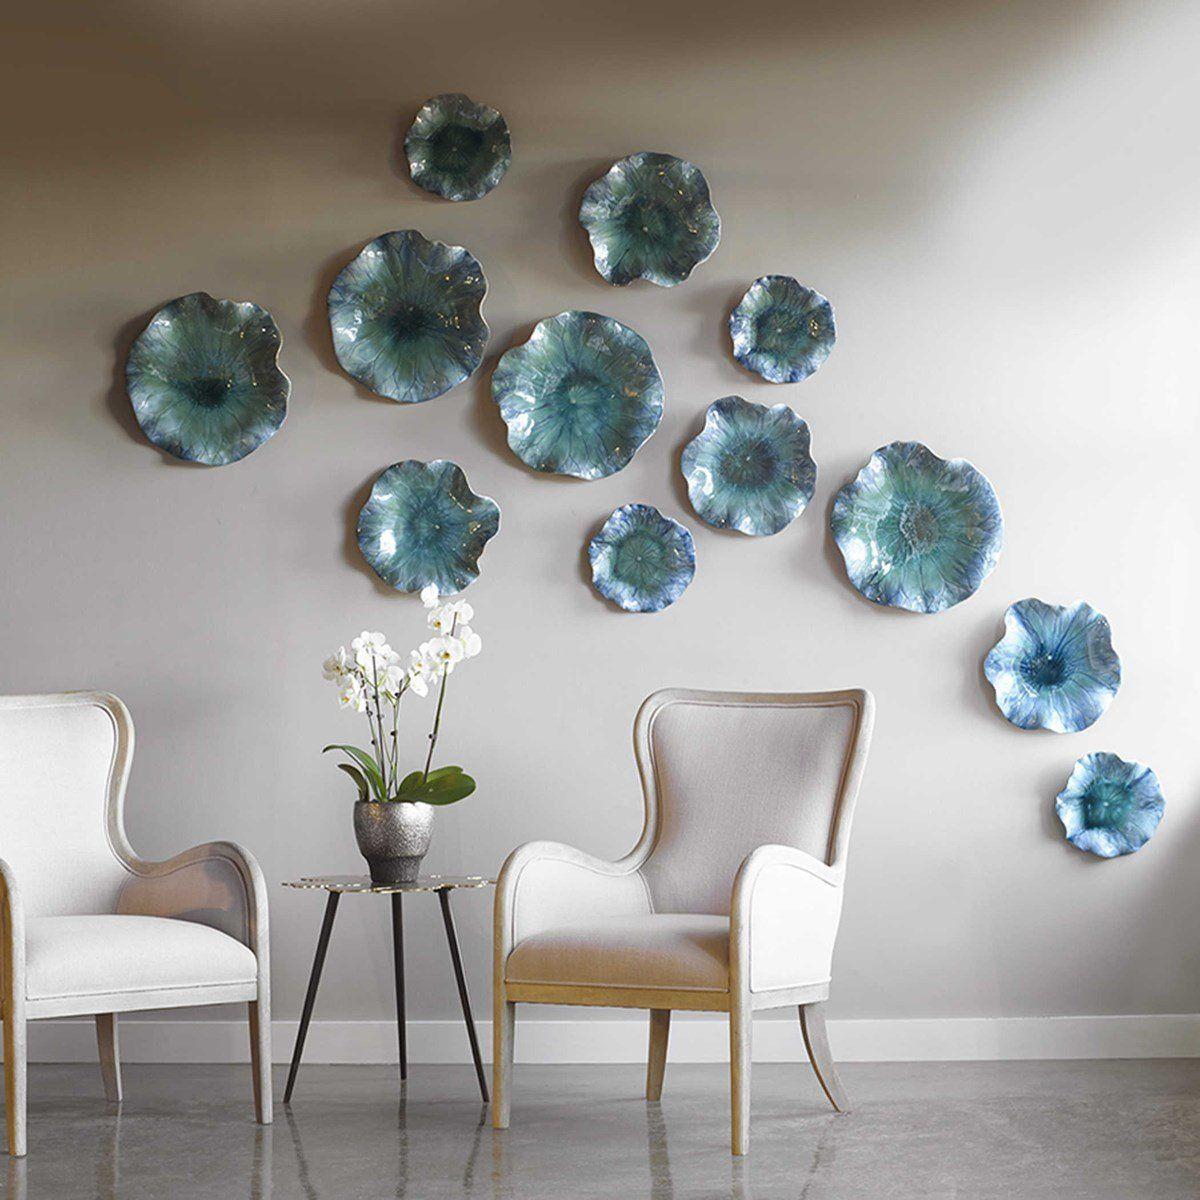 Abella Ceramic Flowers, S/3Default Title